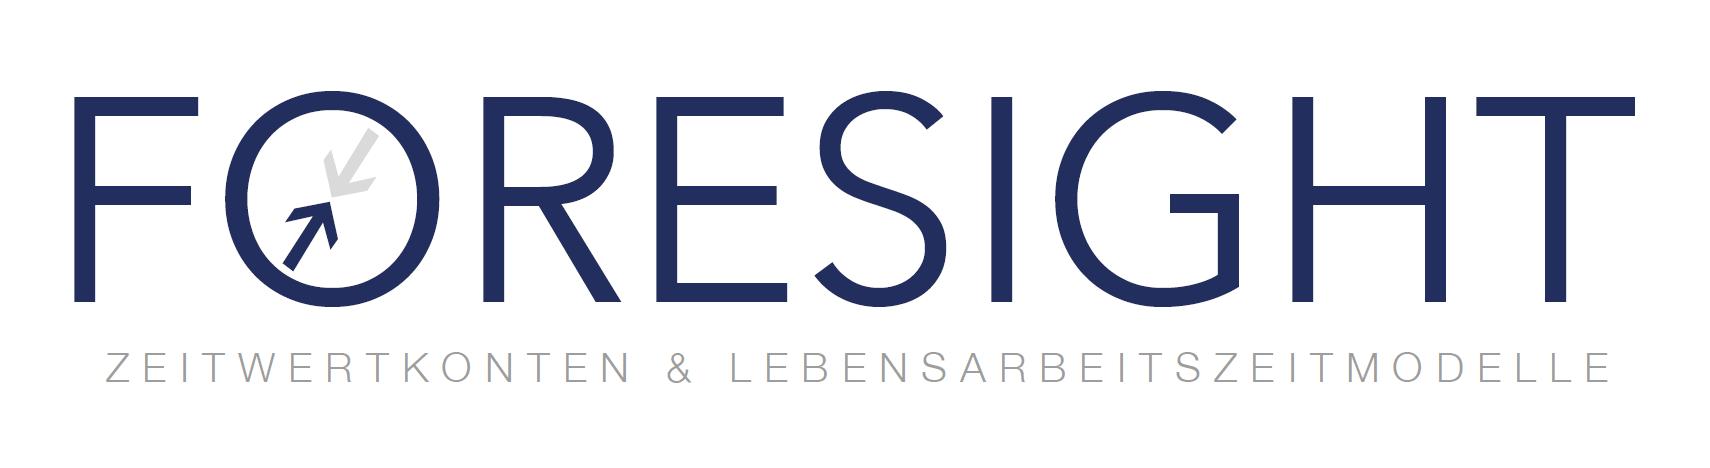 Foresight GmbH